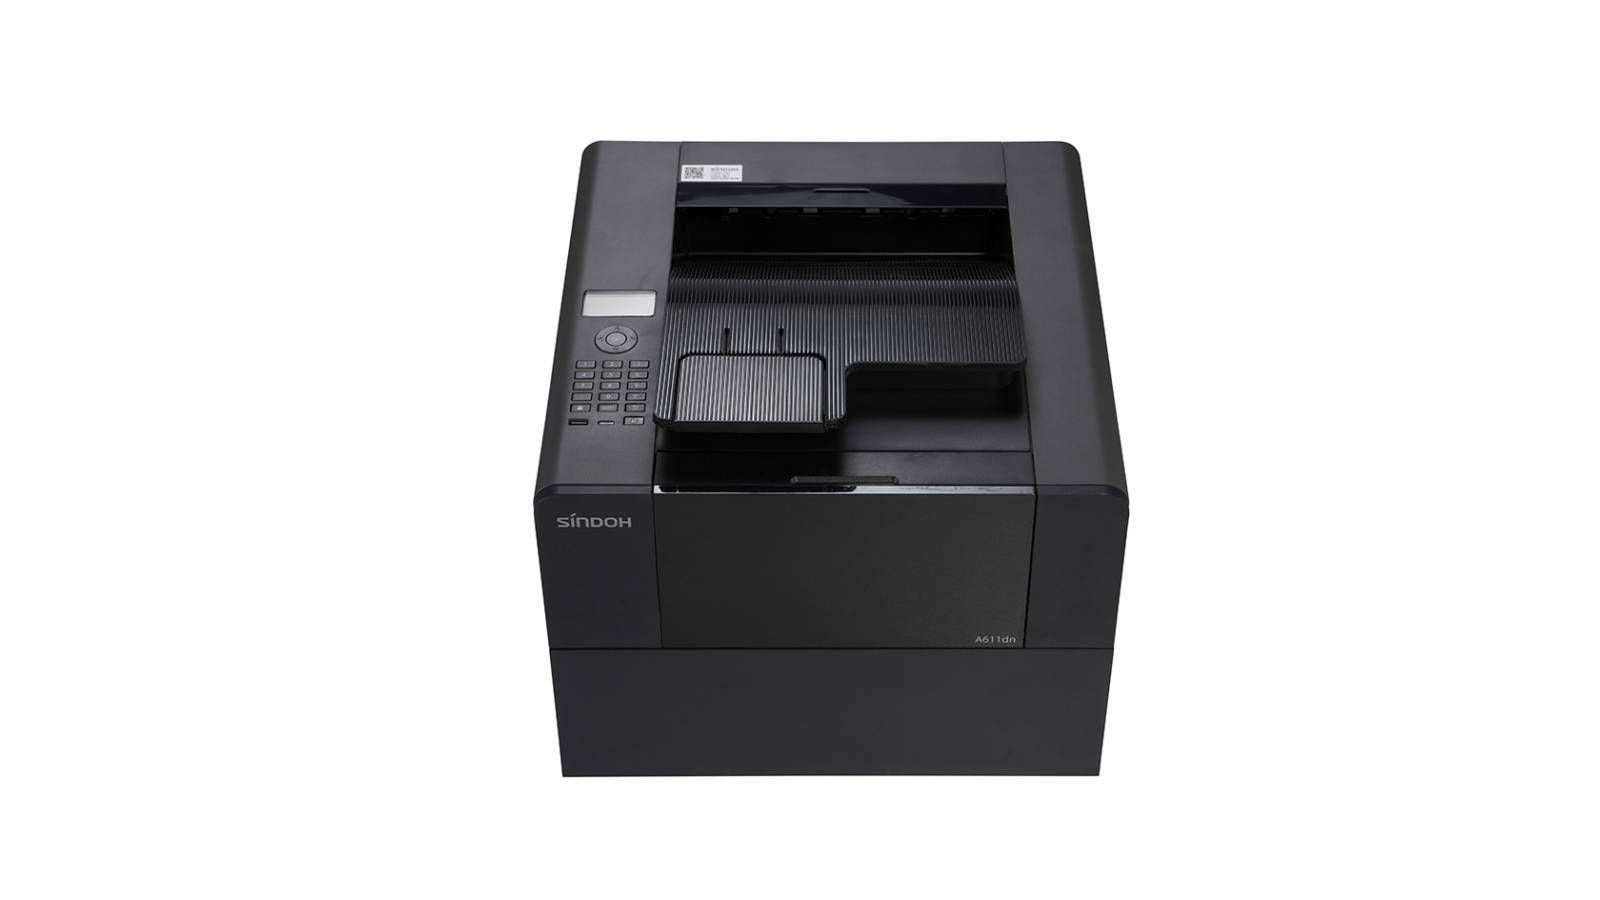 Impresora láser monocromática Sindoh A611